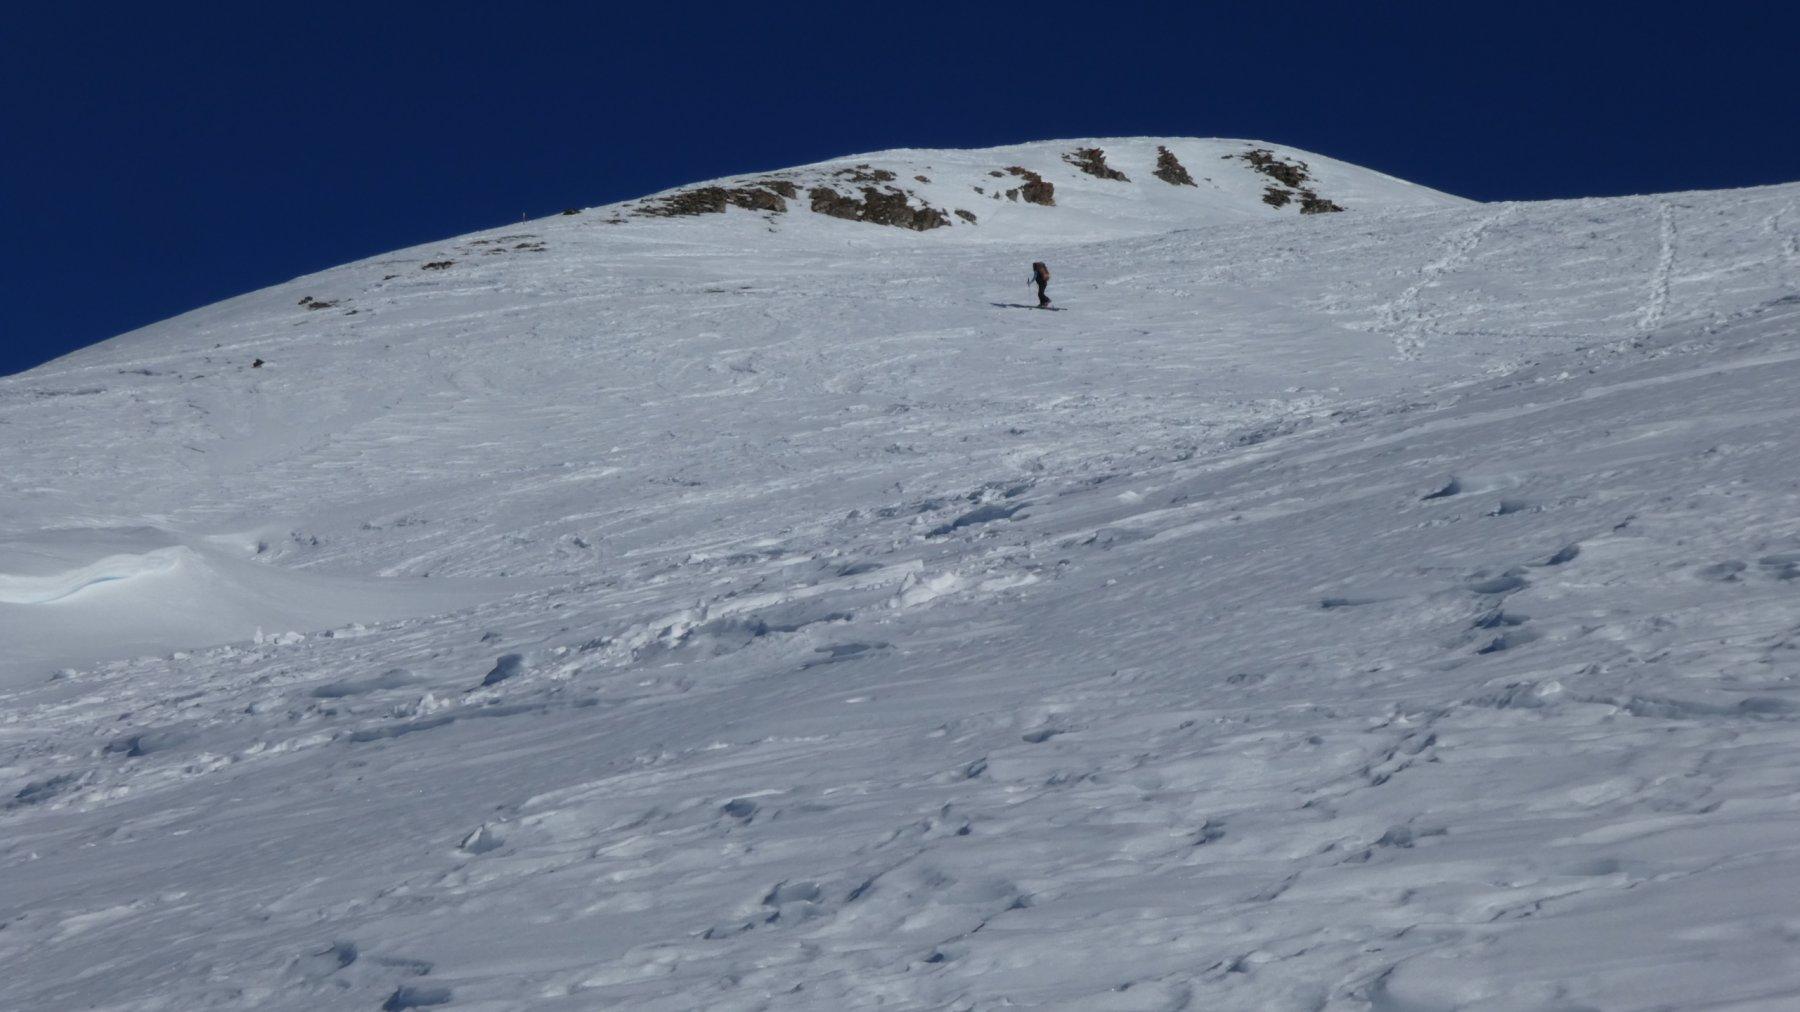 Gardiole de l'Alp (la) e Tete de Molines da Gaudissard 2018-12-31